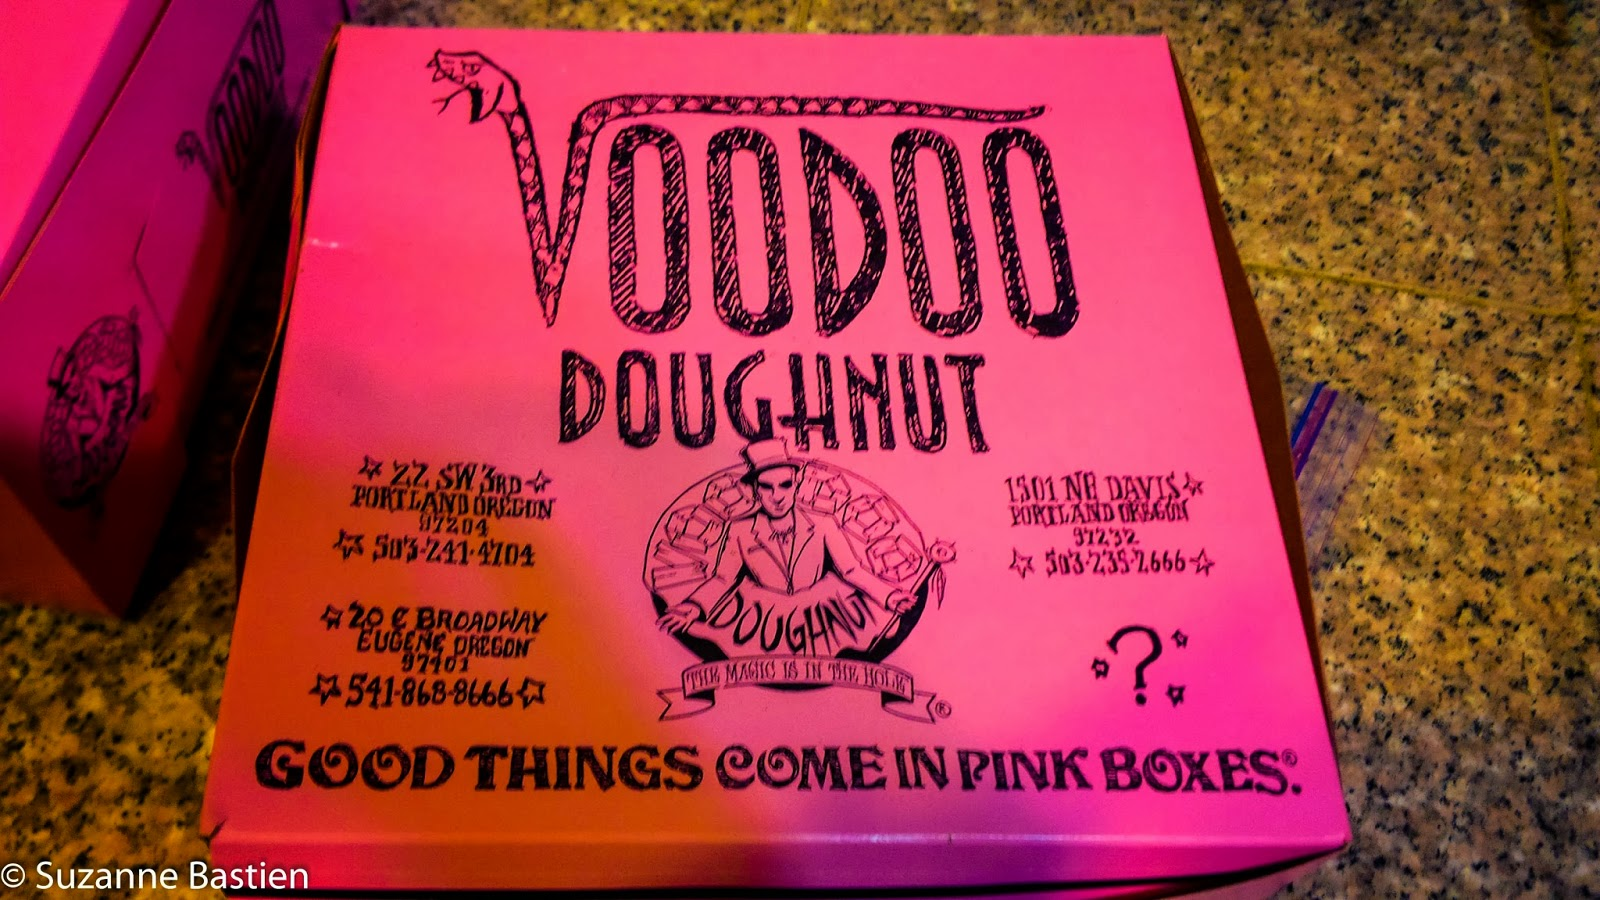 VooDoo-Doughnuts-Denver-Broncos-Fans